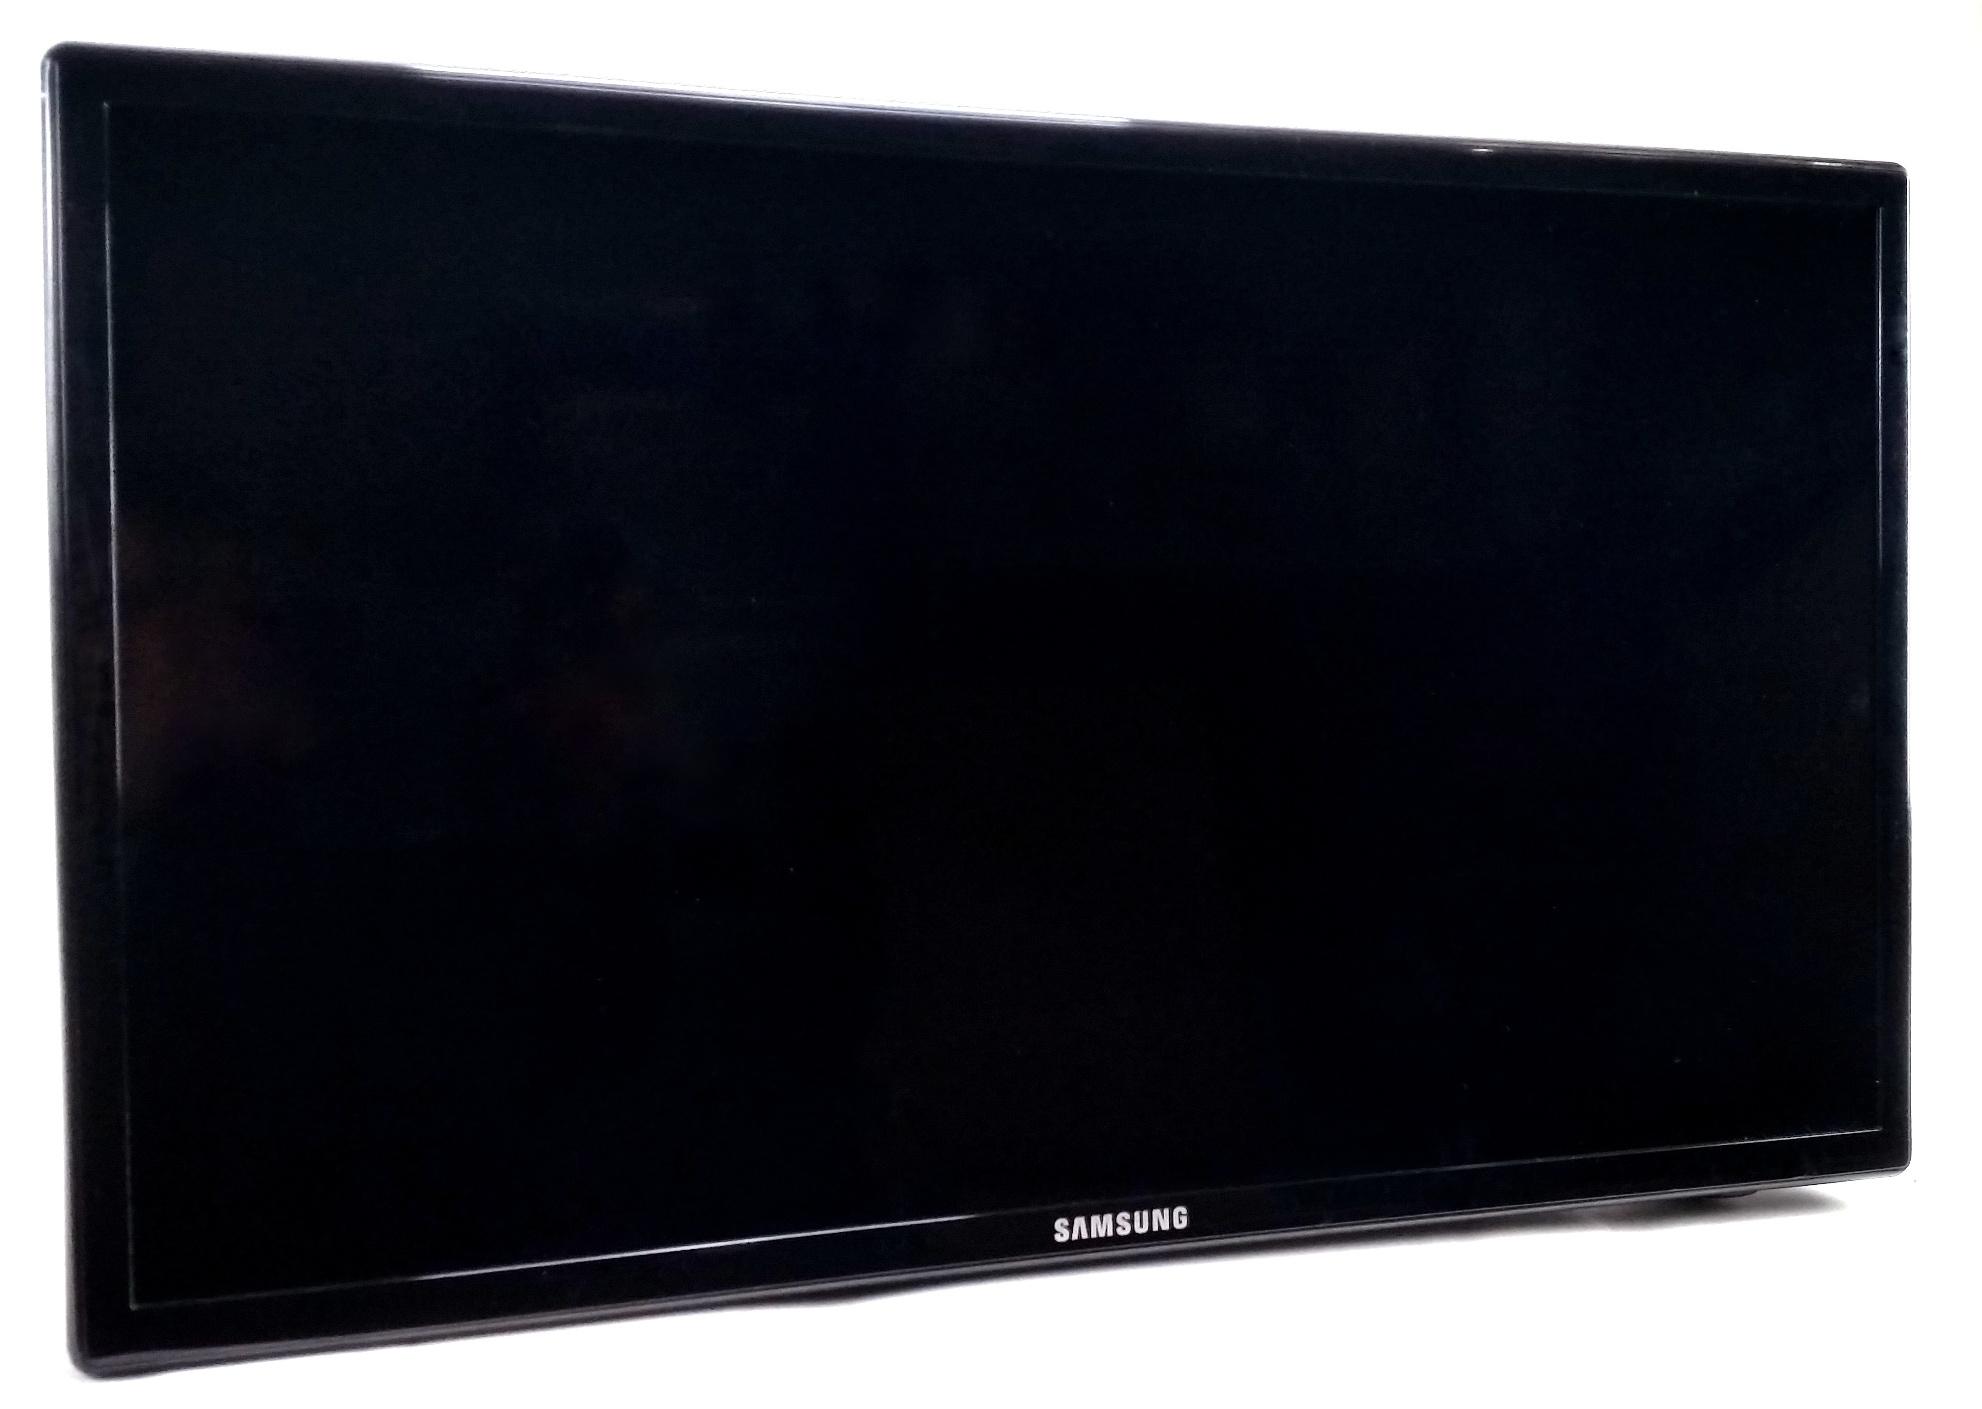 samsung 32 81cm hg32ed470 digital tv led lcd tv hd dvb t2 c hdmi usb ci ebay. Black Bedroom Furniture Sets. Home Design Ideas